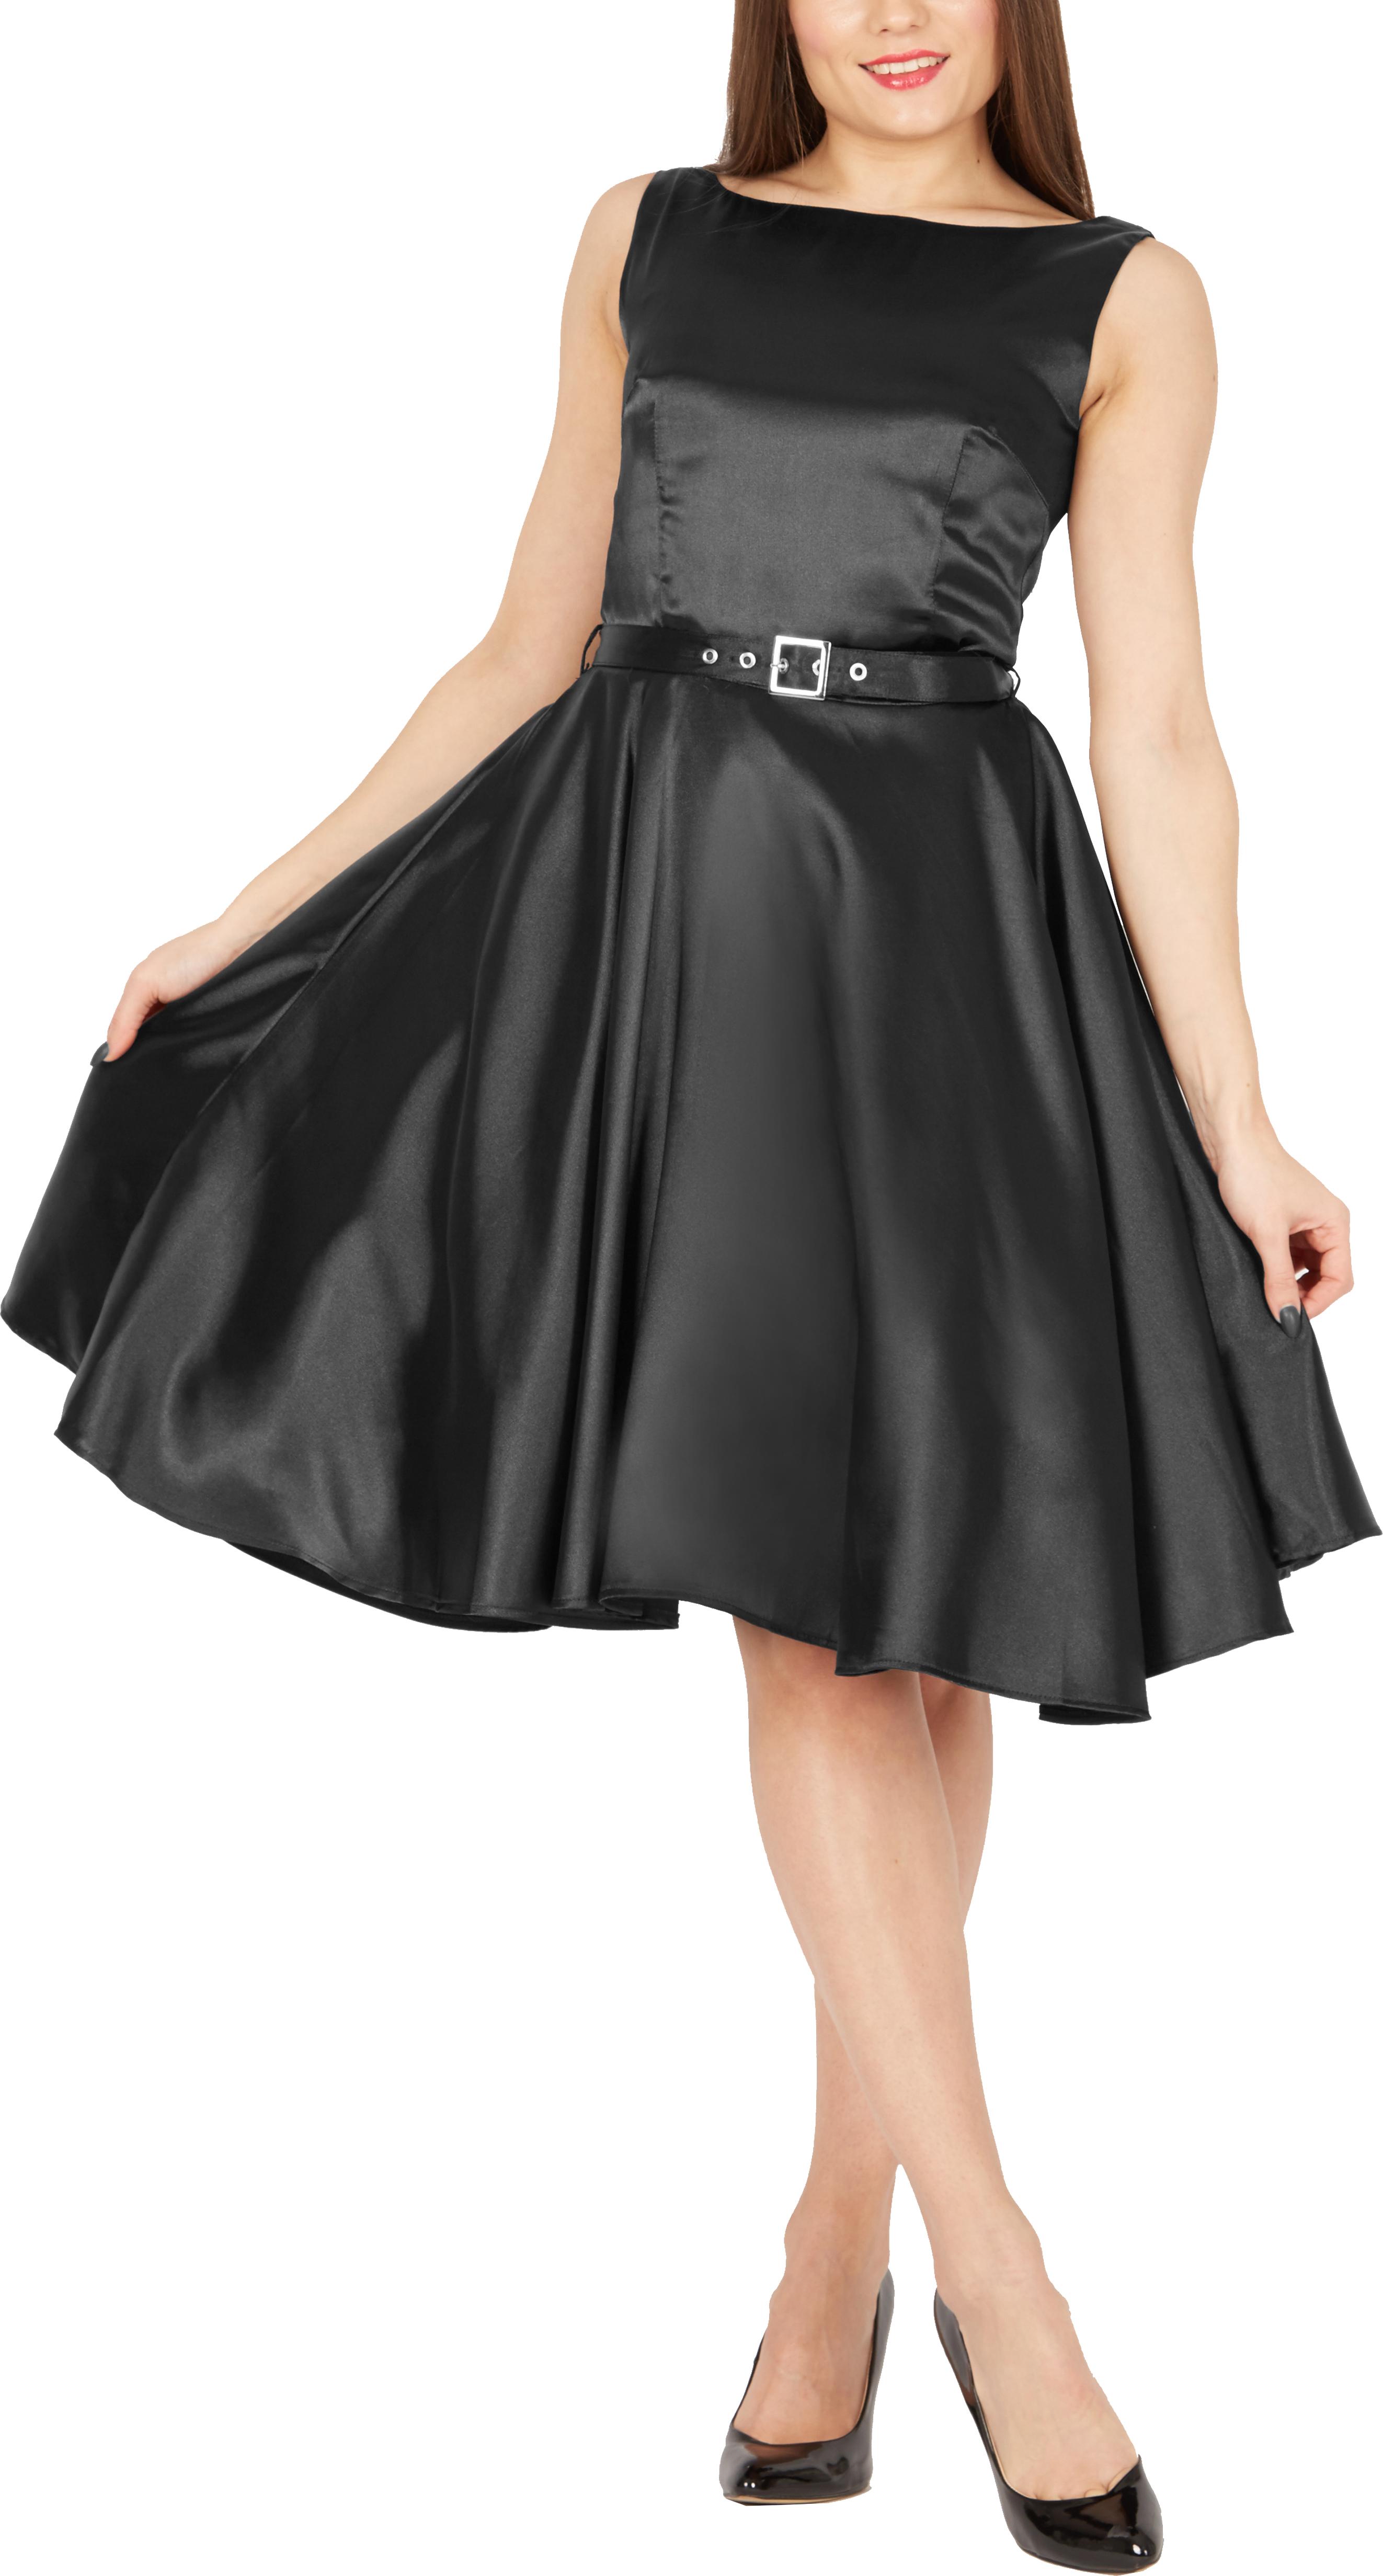 Vintage Satin Dress